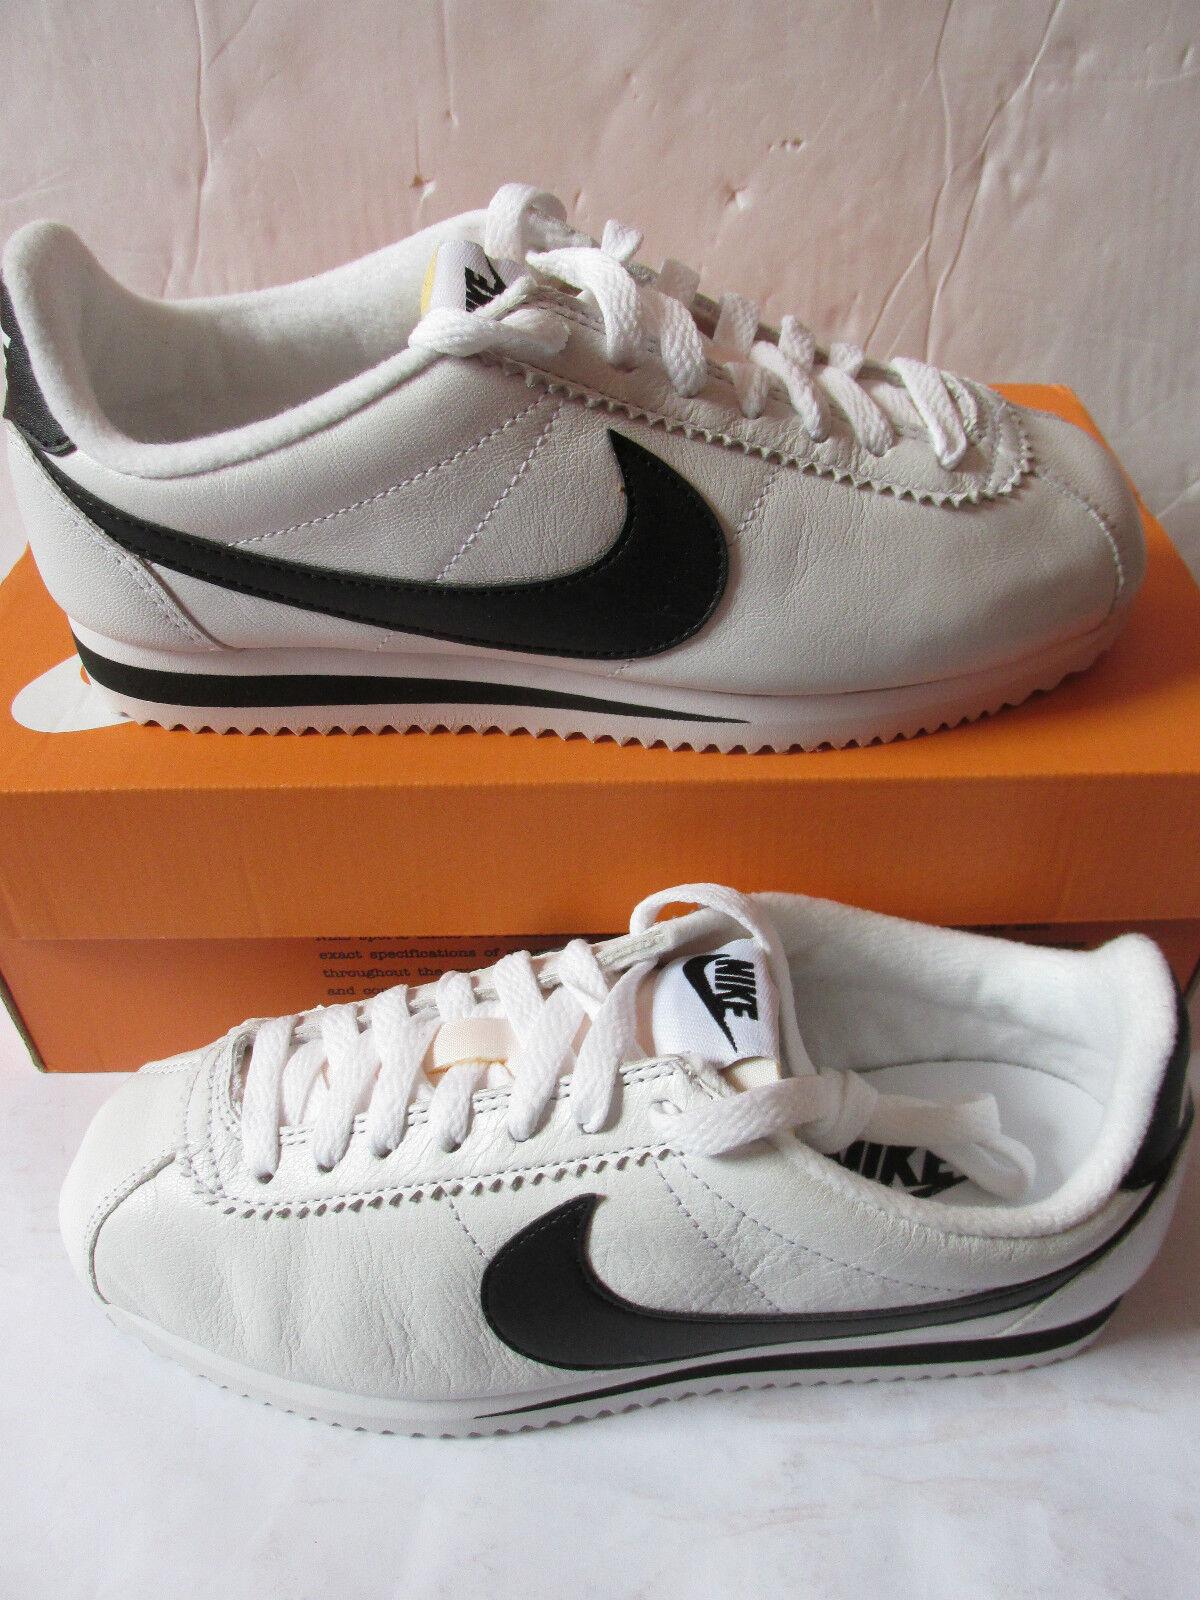 nike classic cortez PREM mens trainers 807480 101 sneakers shoes